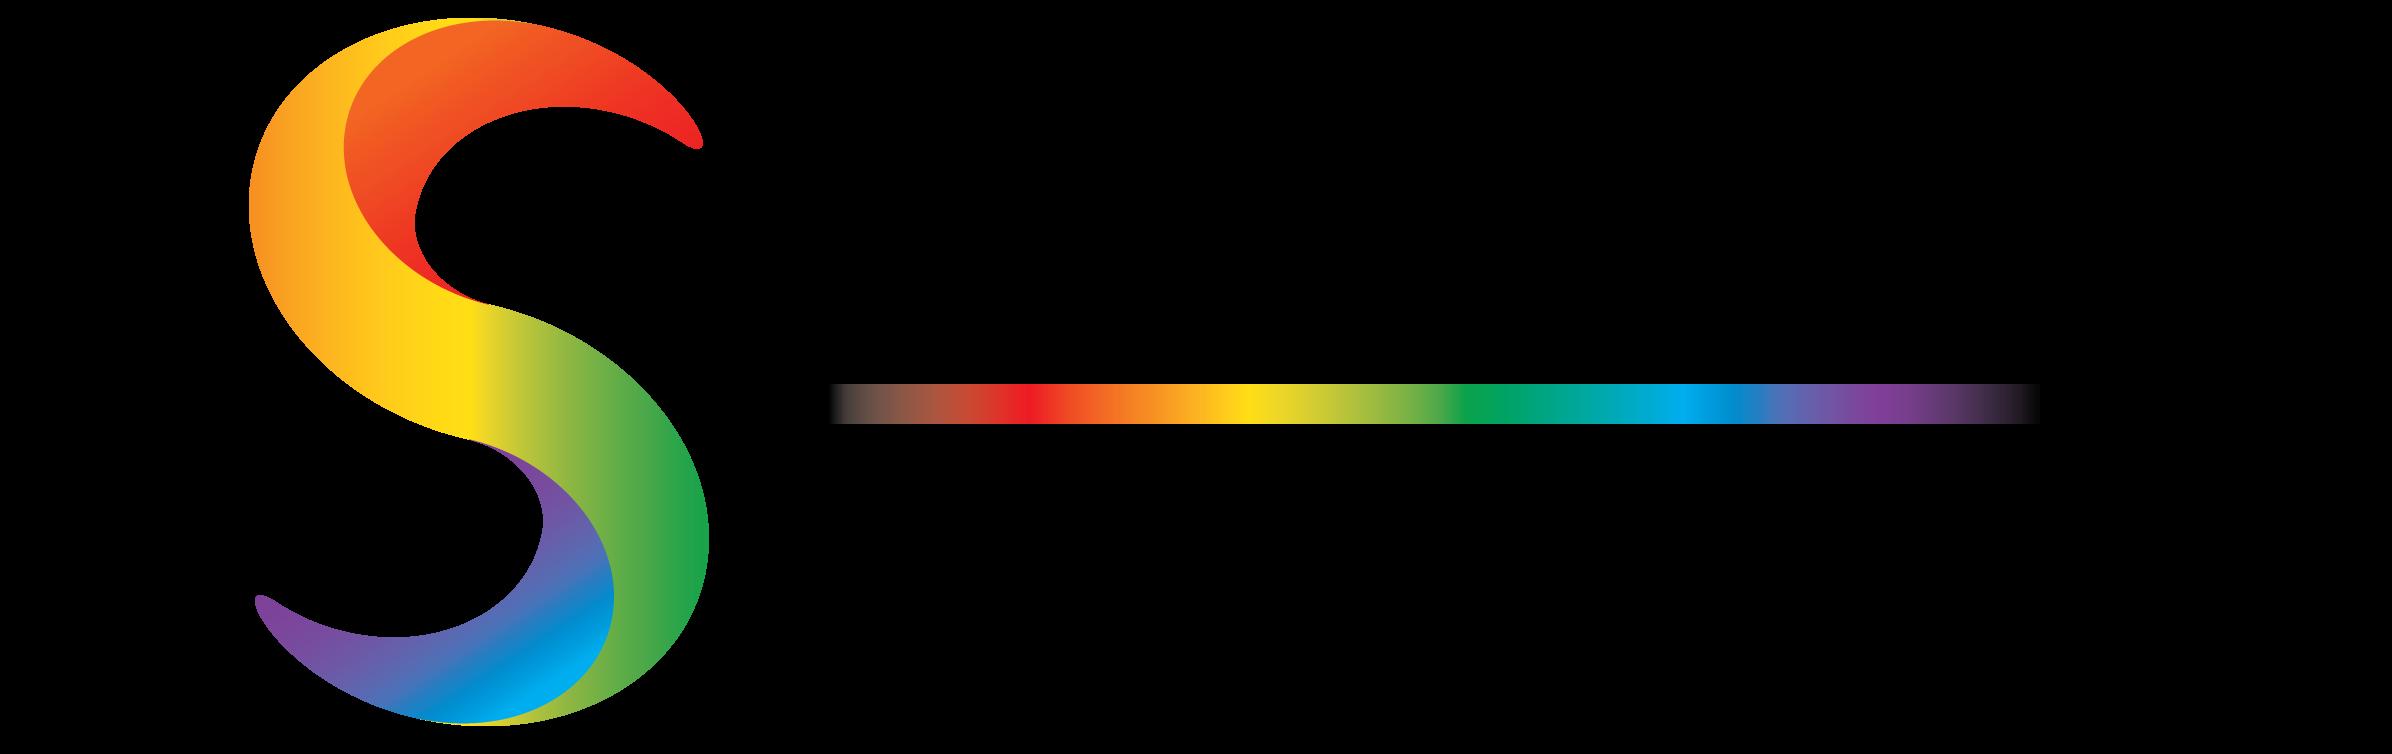 Spectra Colorants Pigment Dispersion Manufacturing